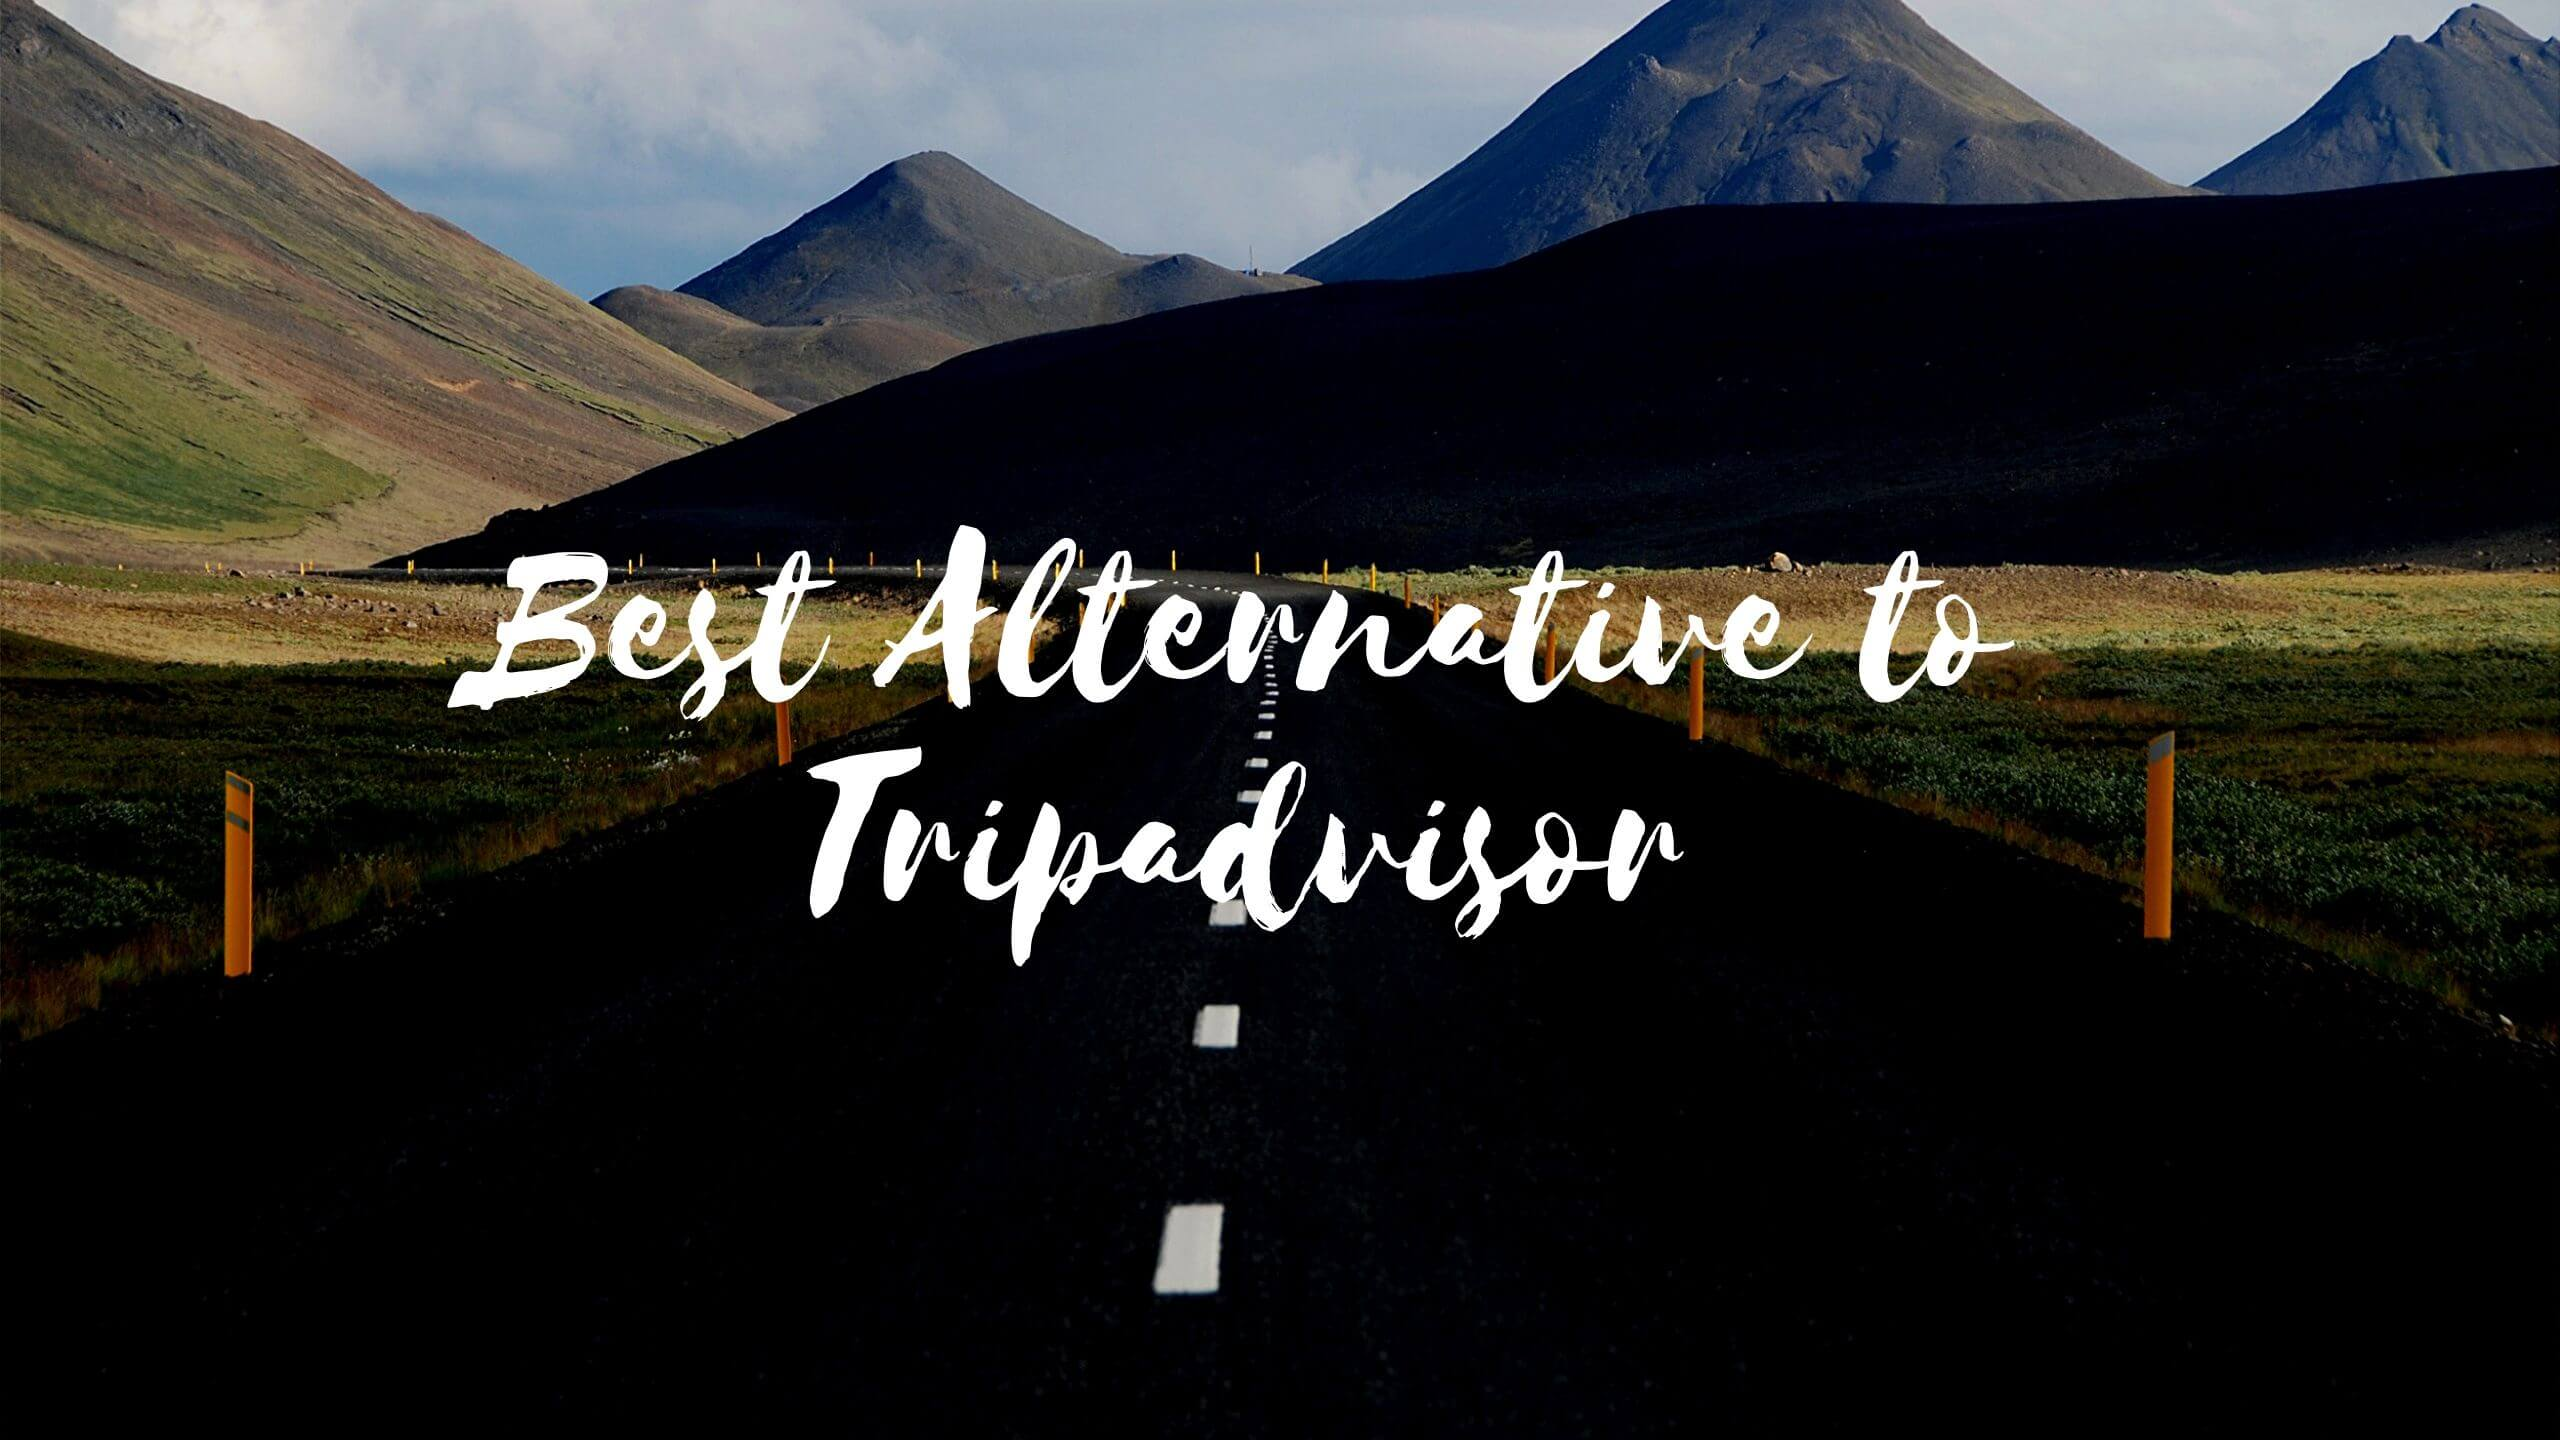 Best Alternative to Tripadvisor